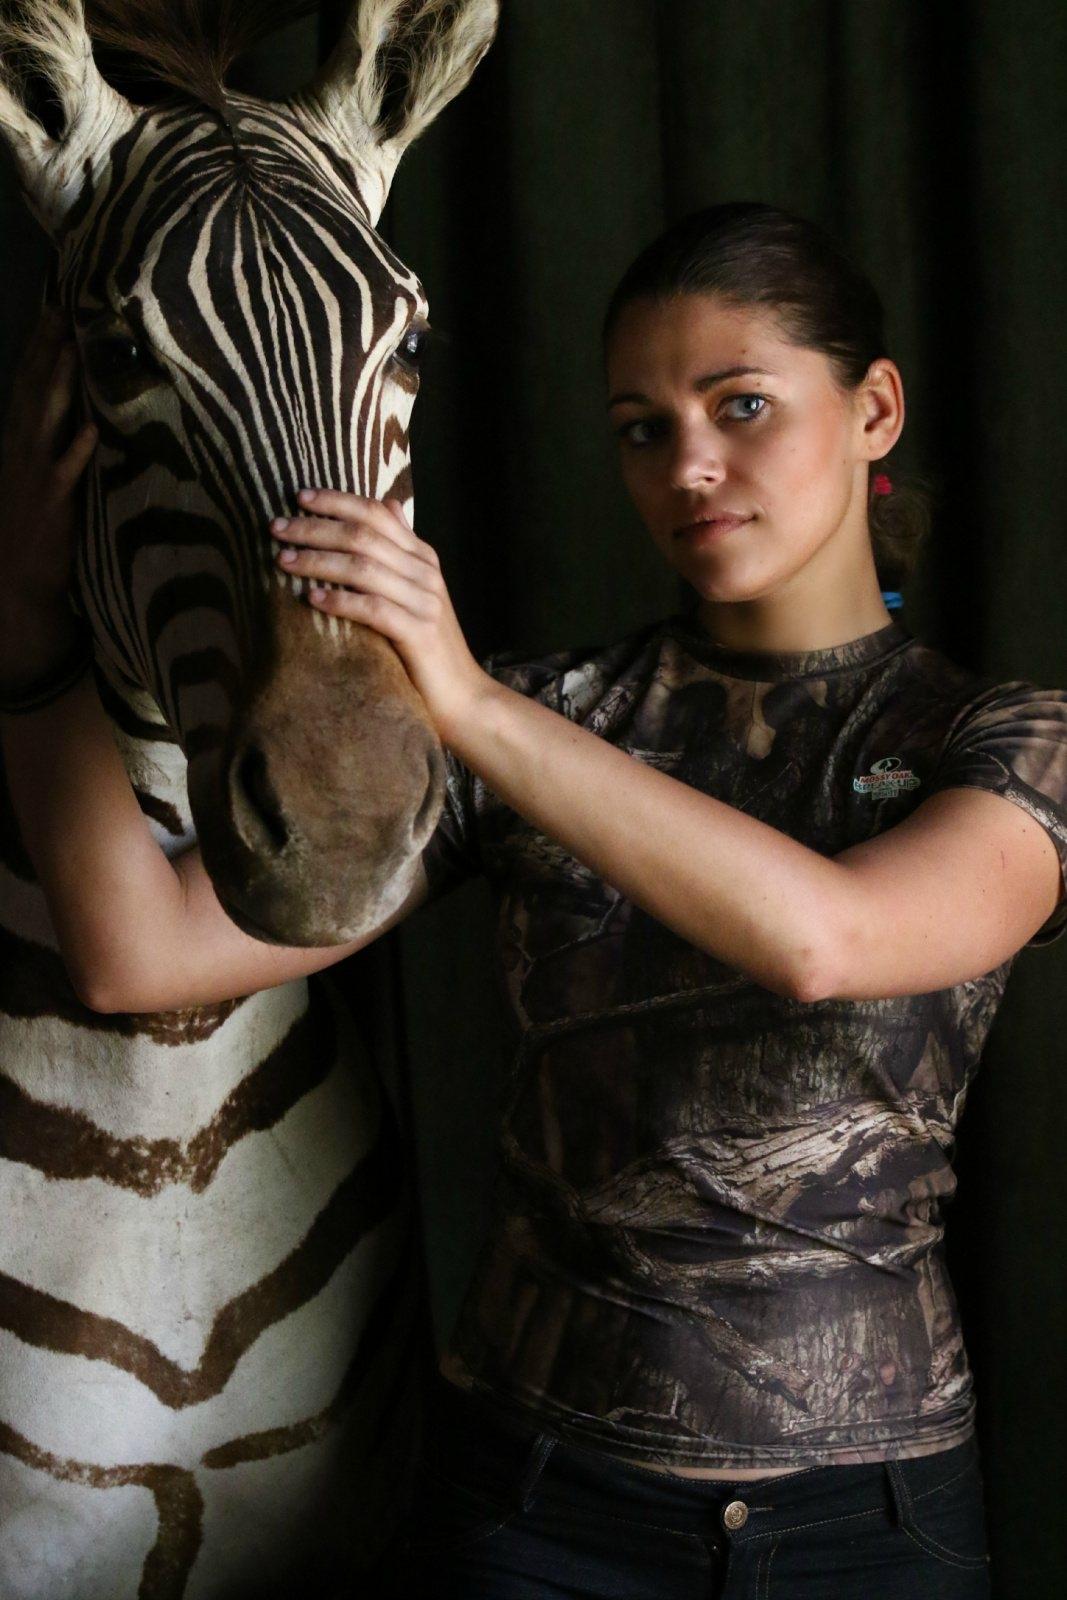 2-huntress-zebra